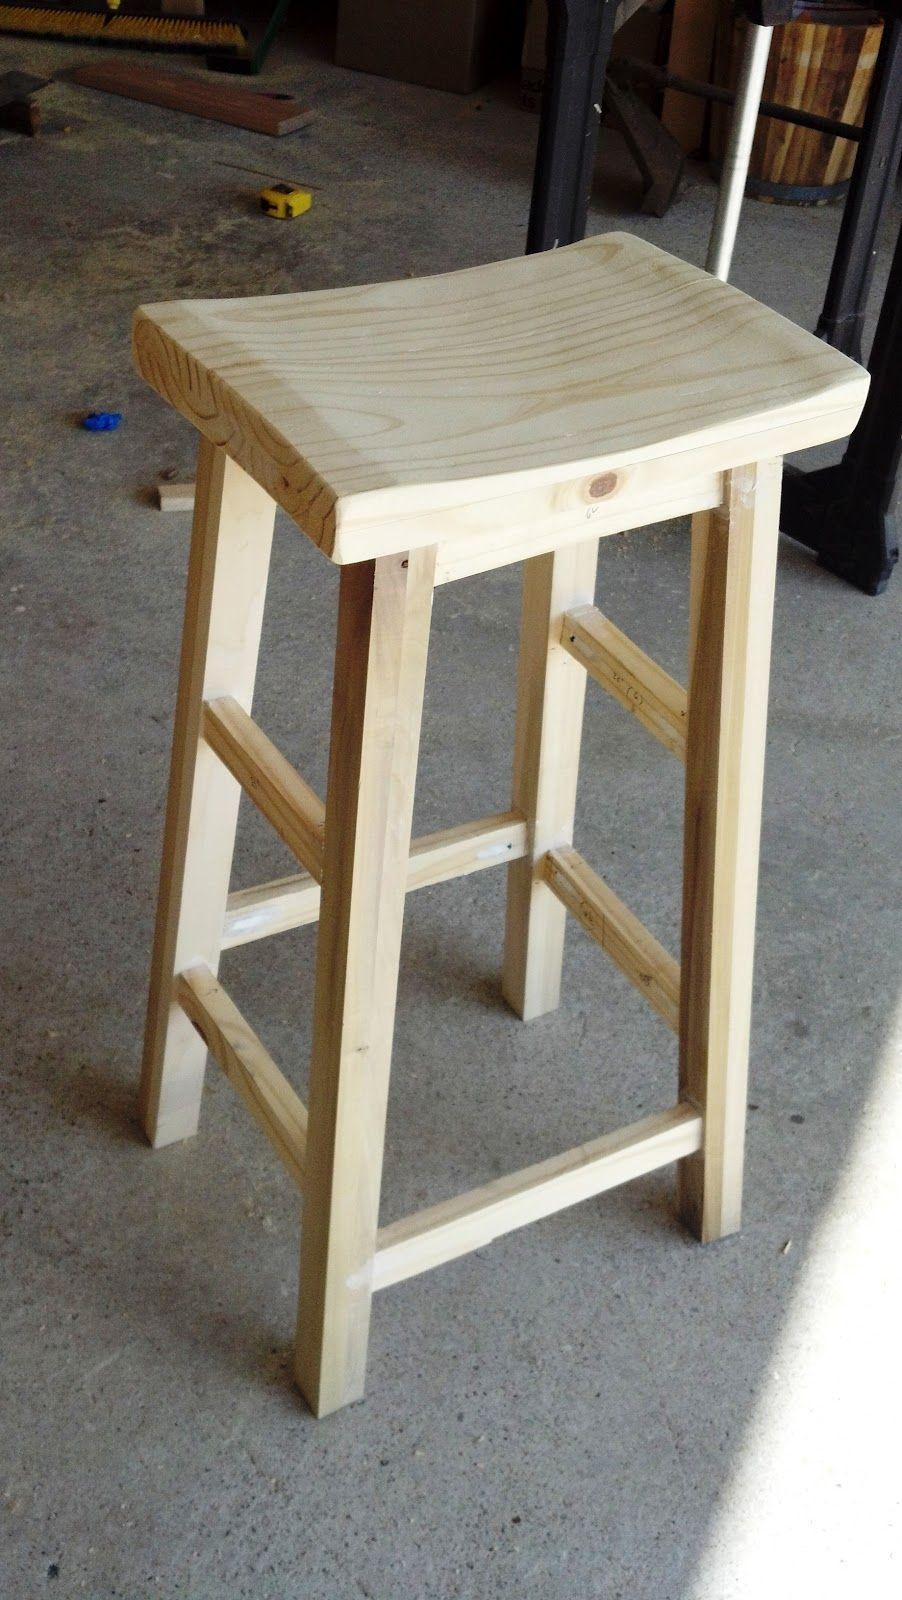 DIY Barstools.... Add to the honey please do list